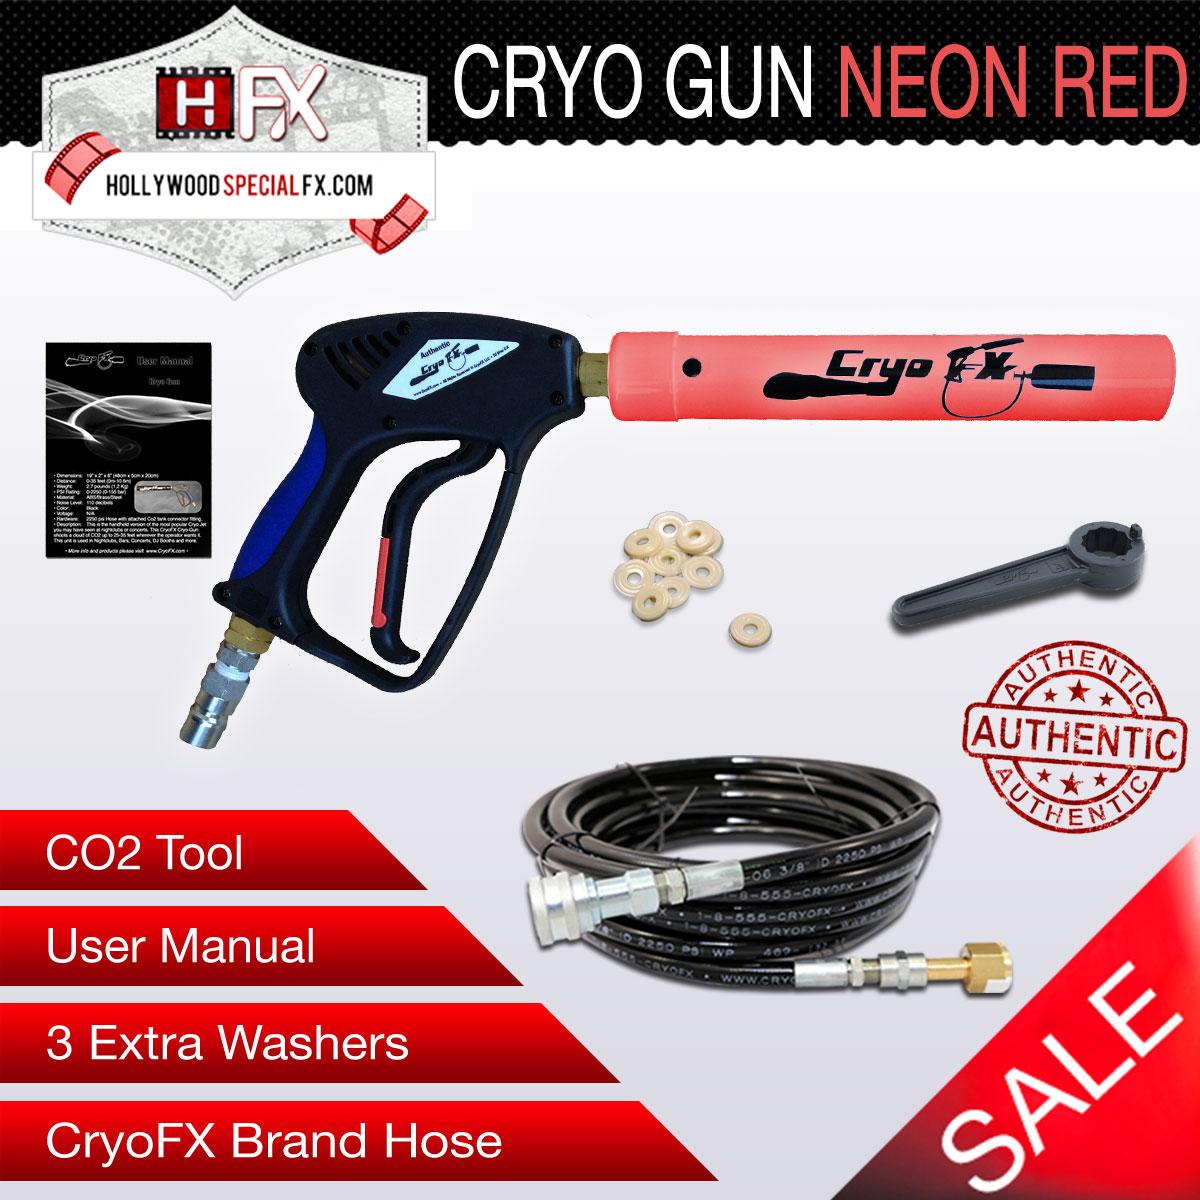 CO2 Cryo Gun NEON Red